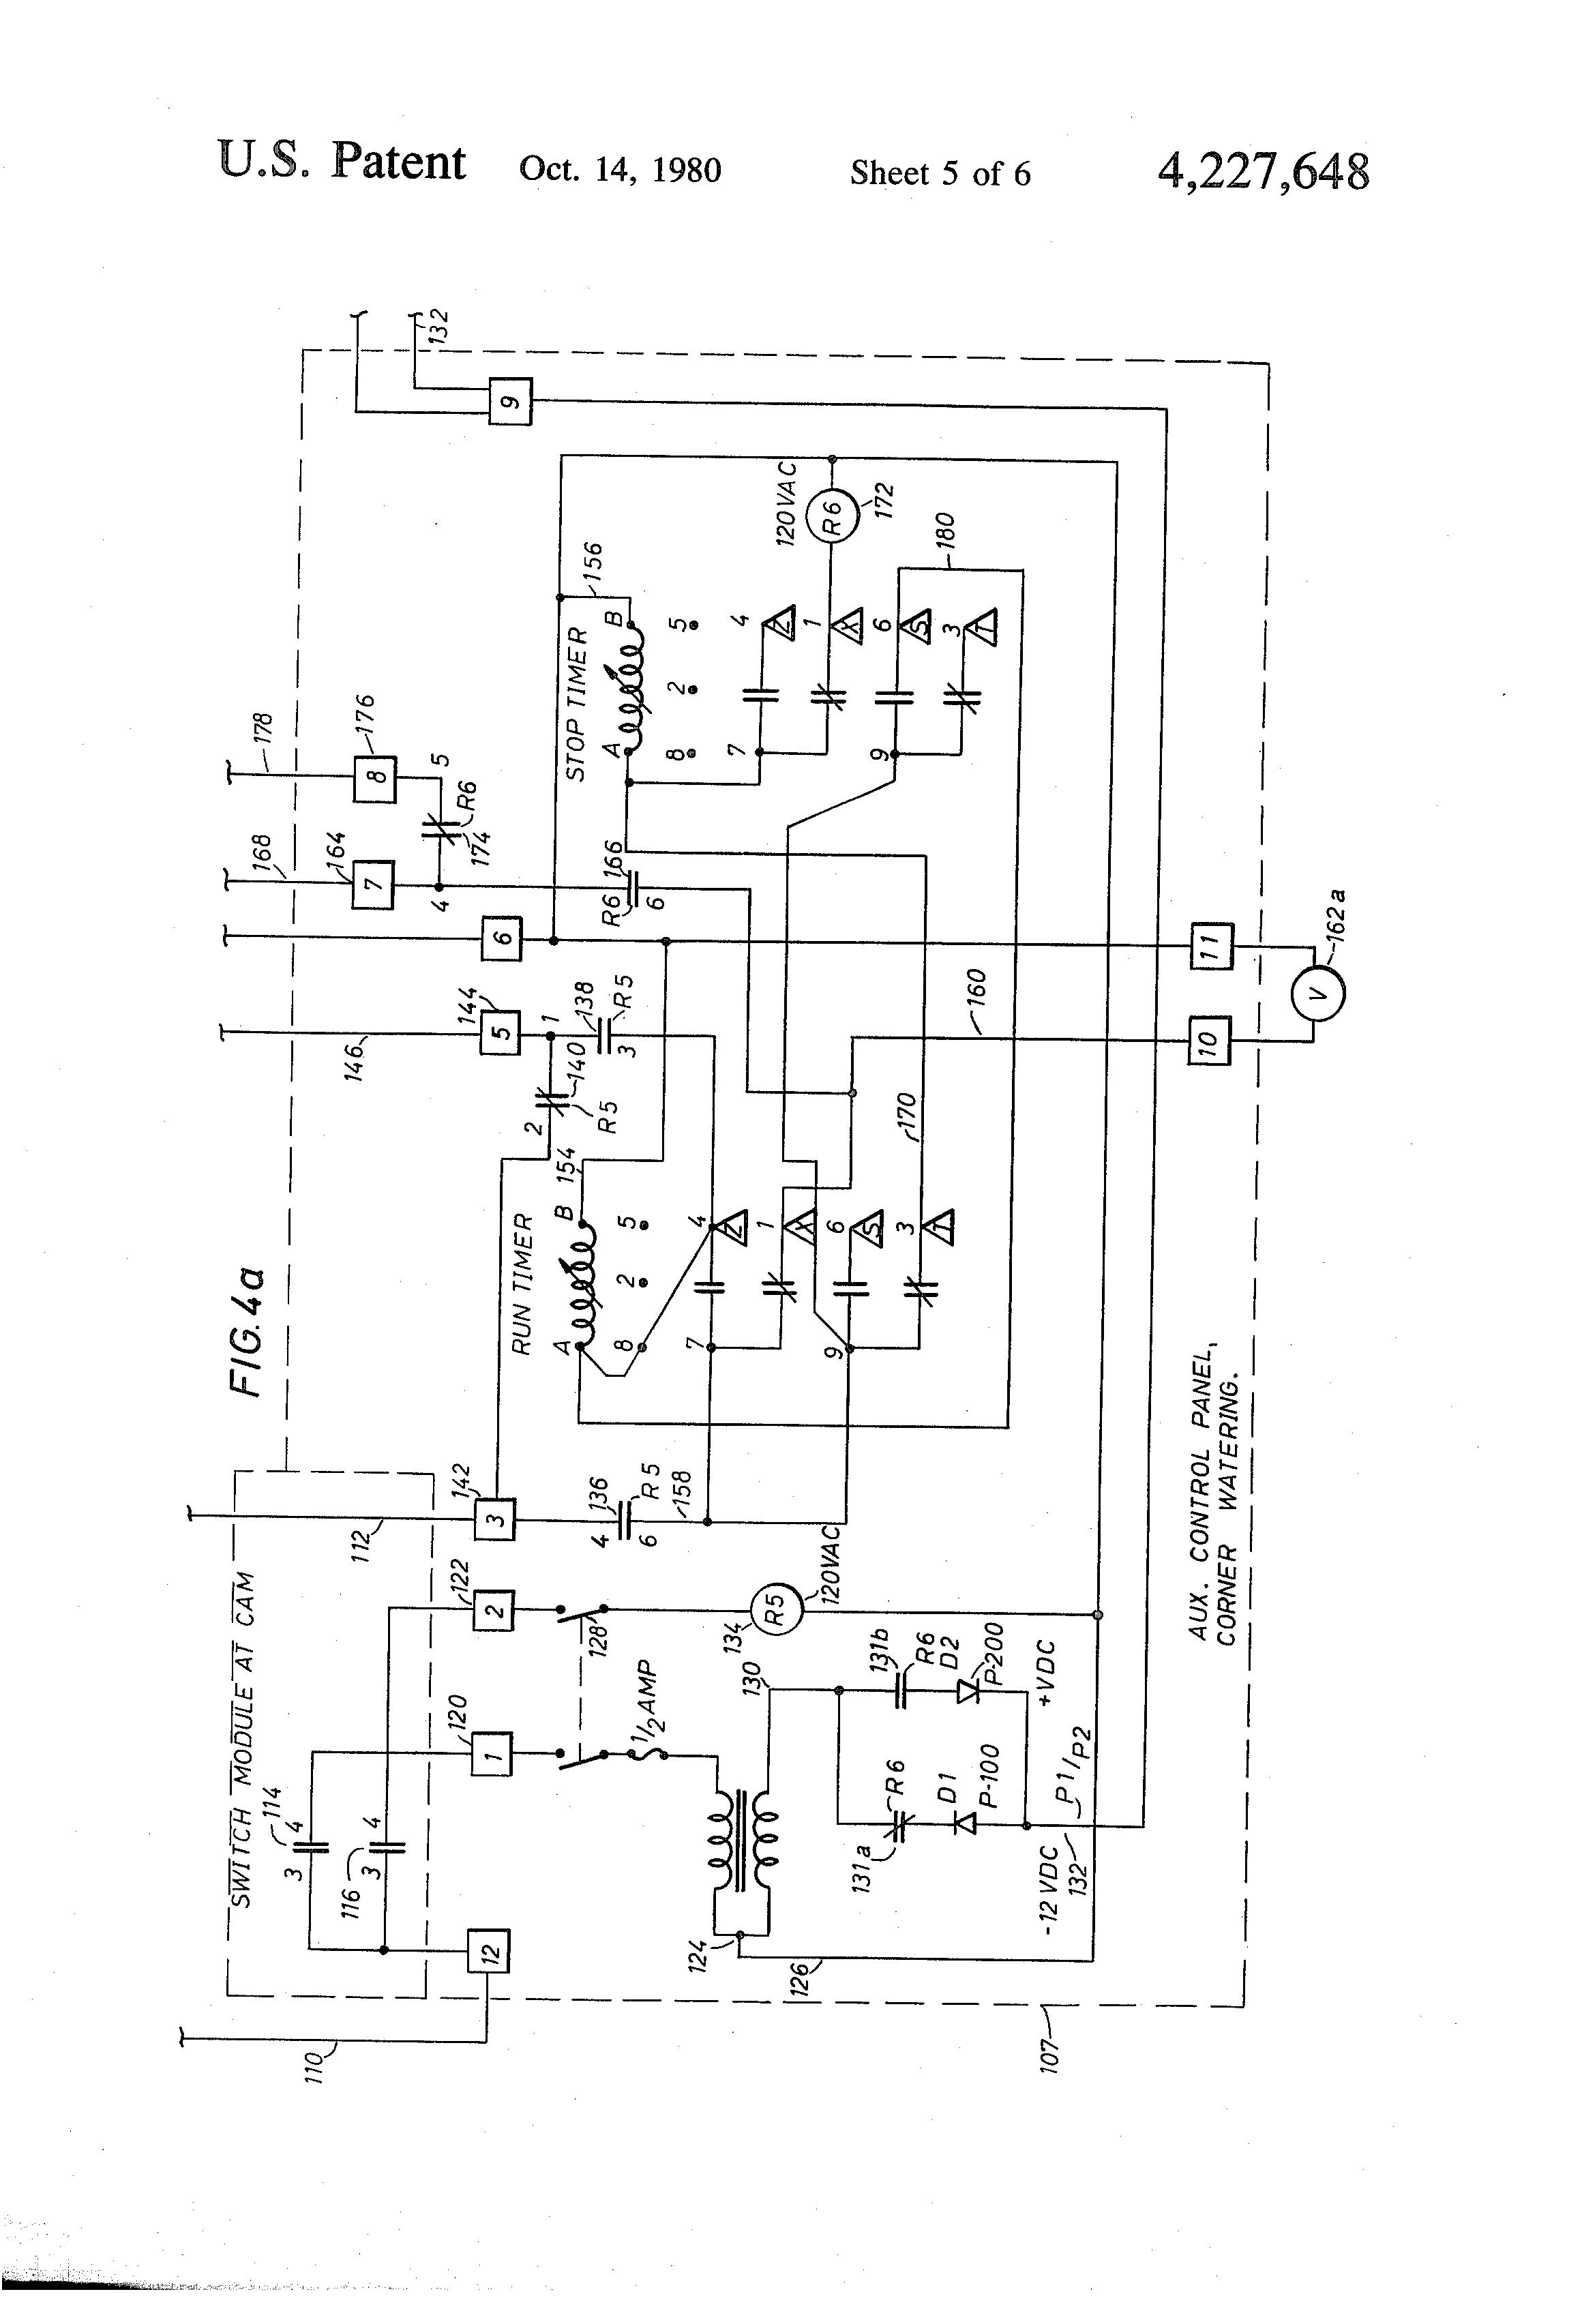 Reinke Irrigation Wiring Diagram Detailed Diagrams System Patent Us4227648 Center Pivot Having Apparatus Control Box